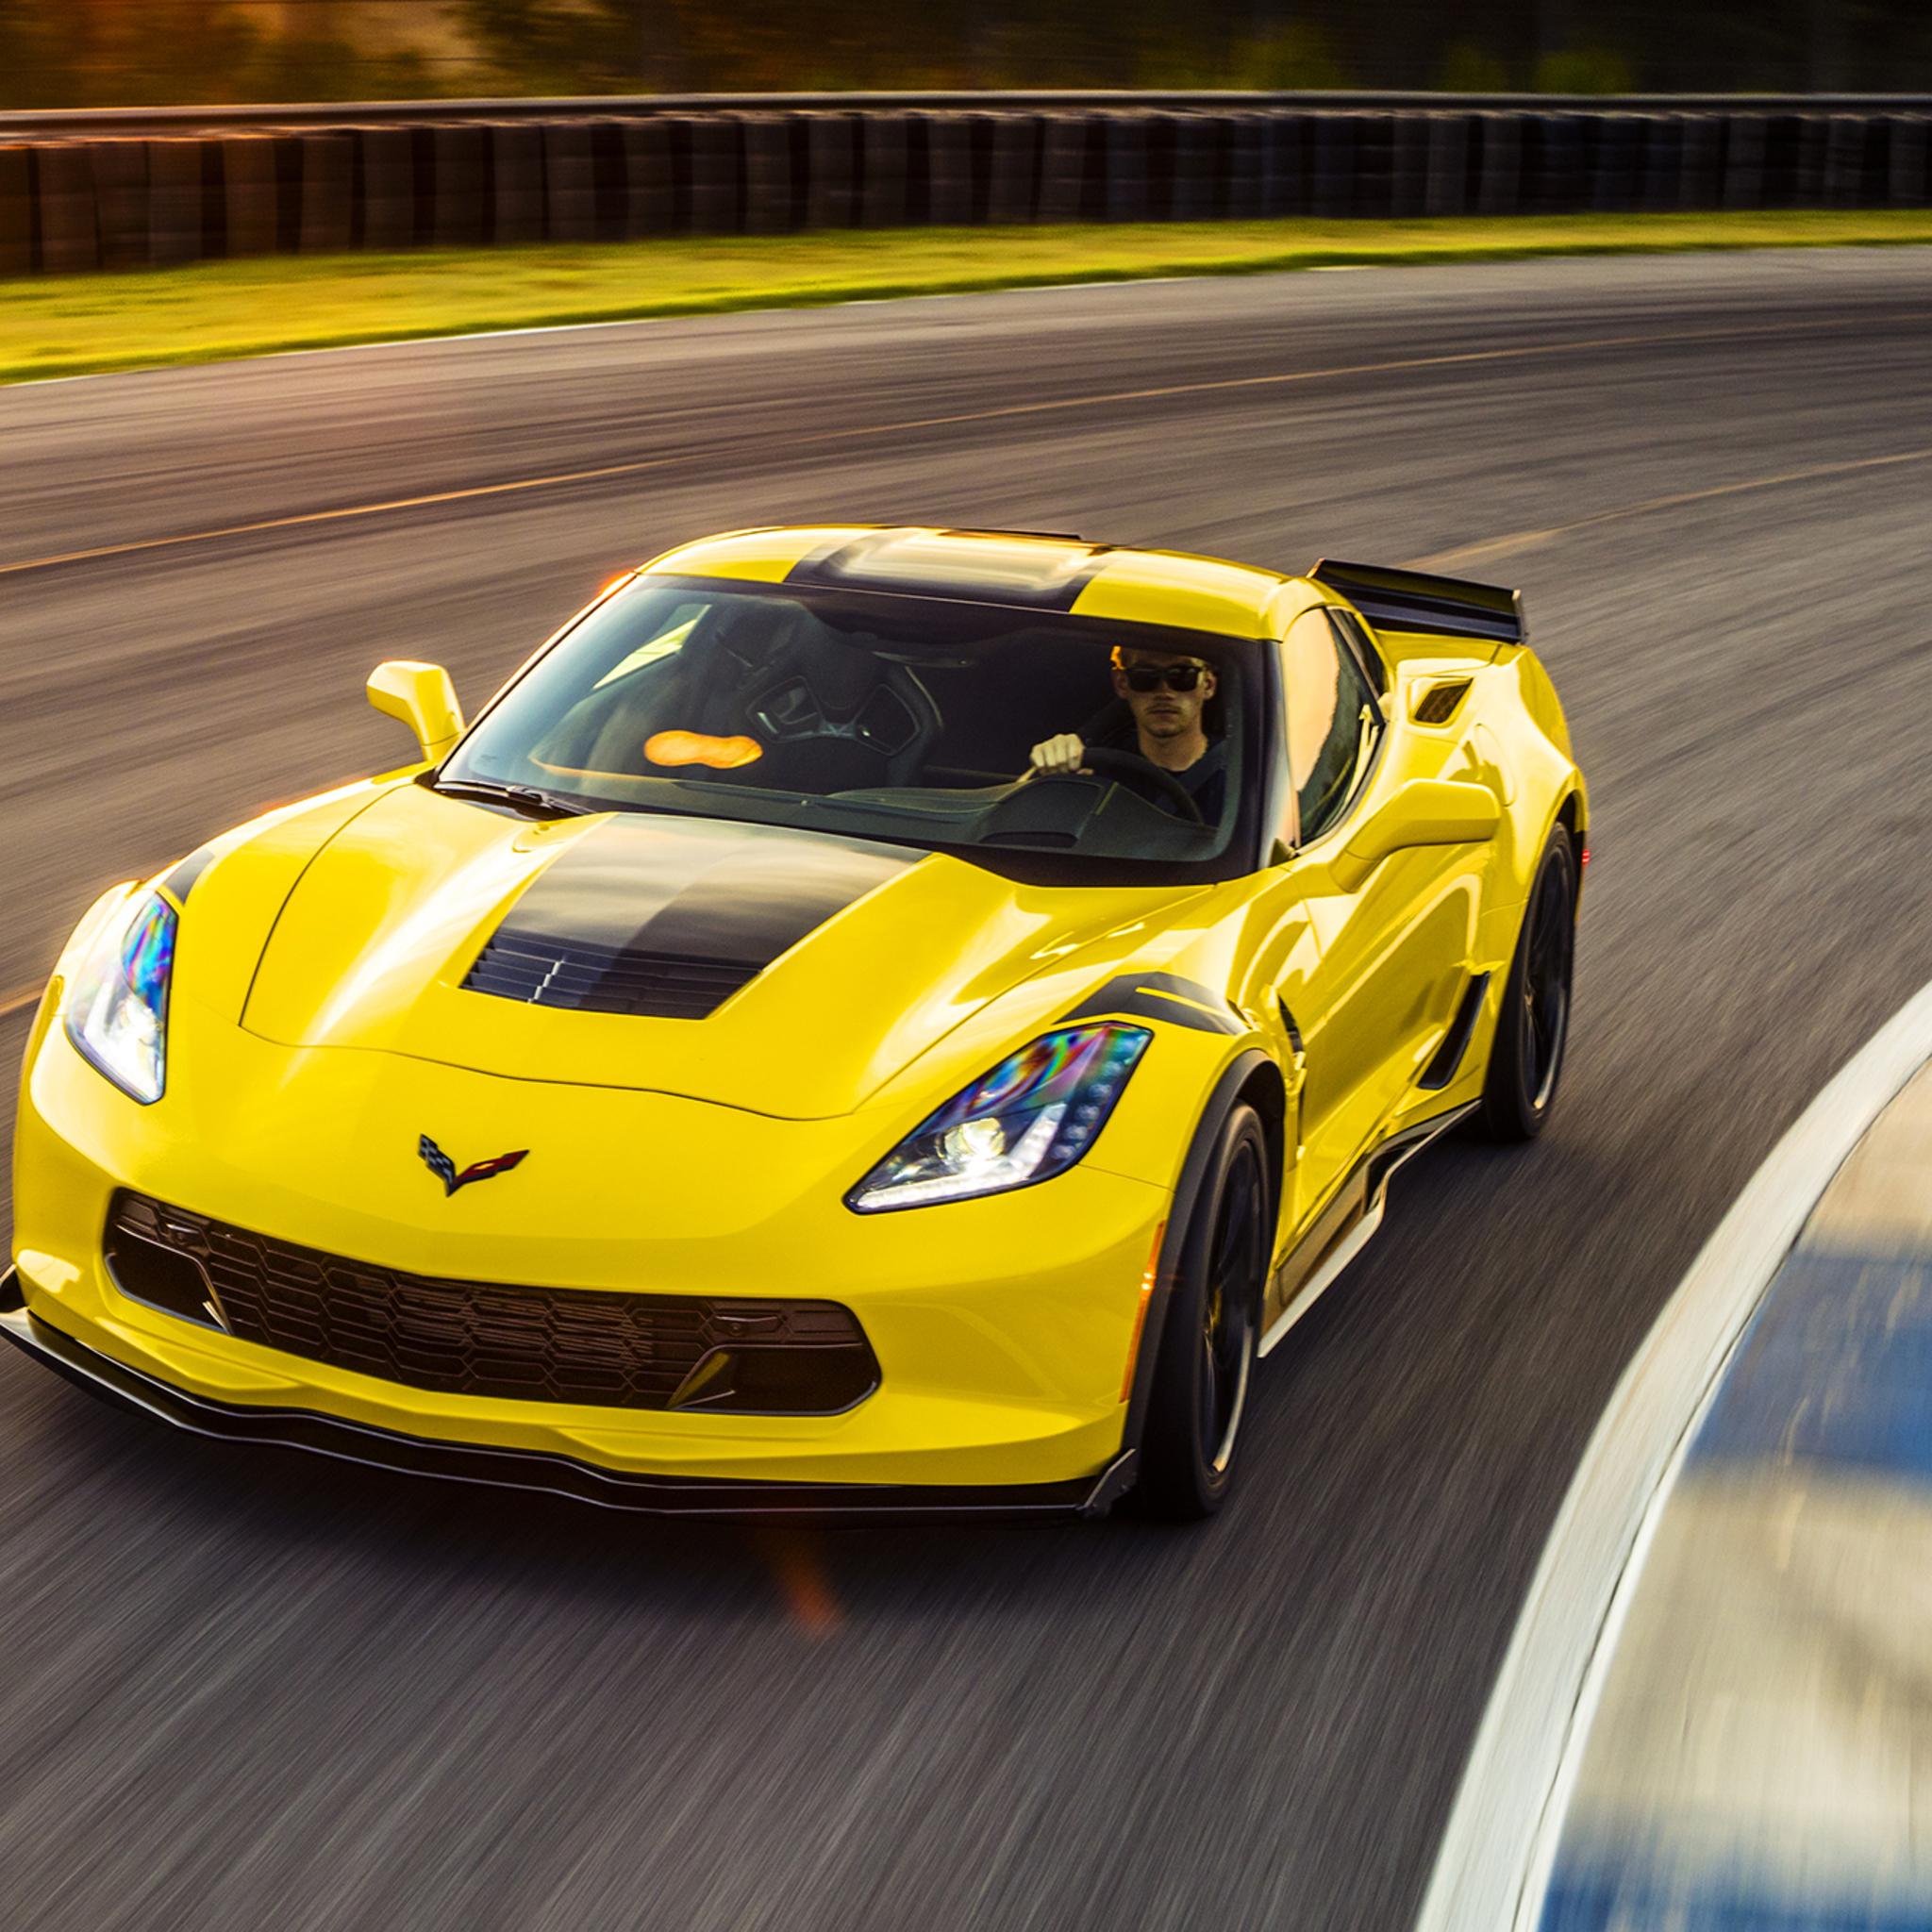 2048x2048 2017 Chevrolet Corvette Grand Sport Ipad Air HD